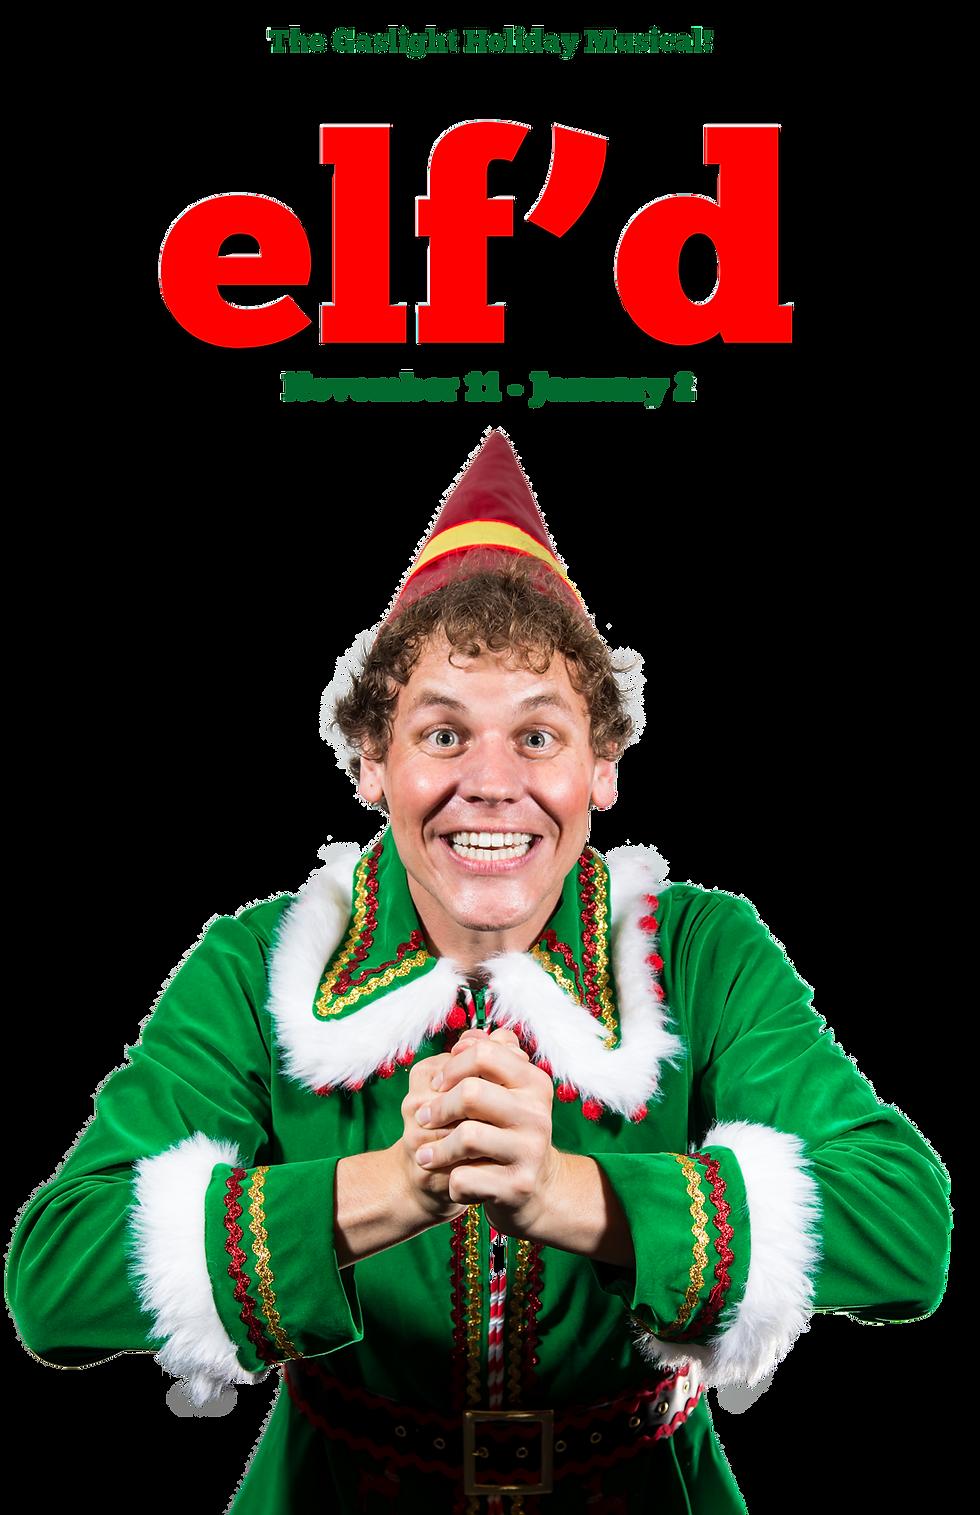 elfd_Poster.png